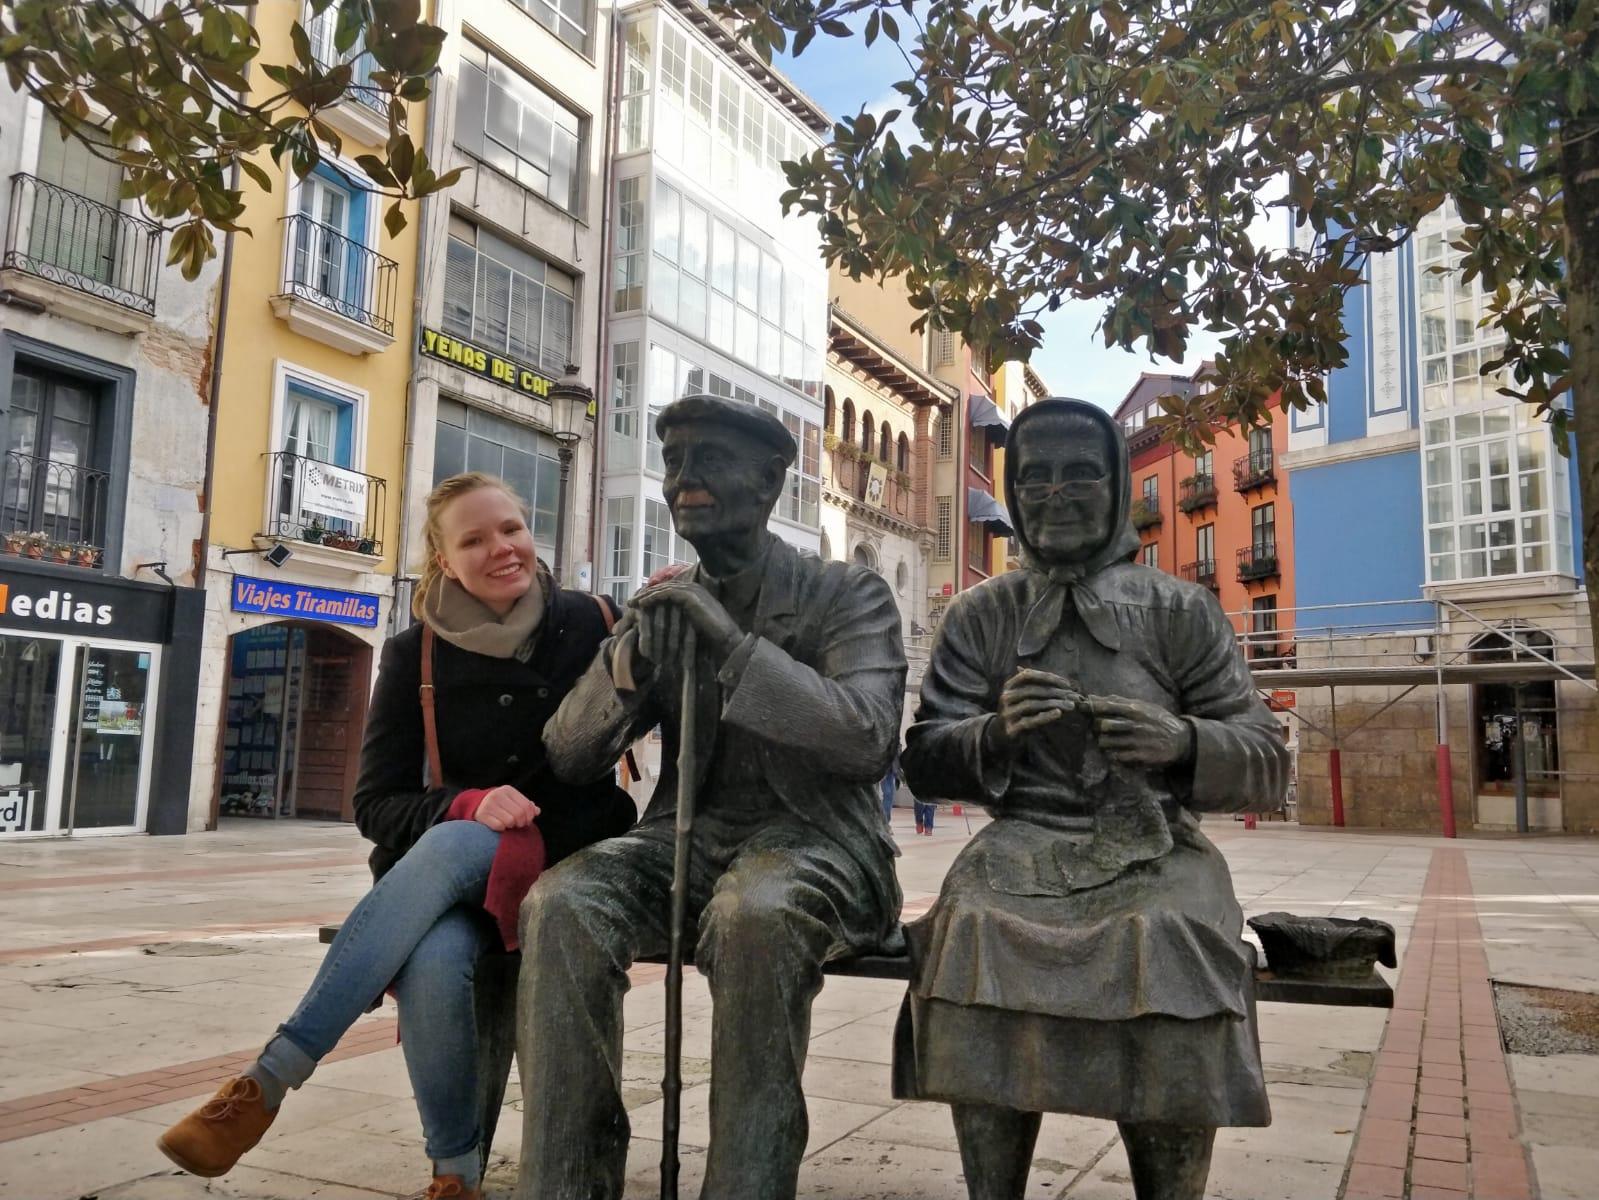 Persona sentada junto a dos estatuas